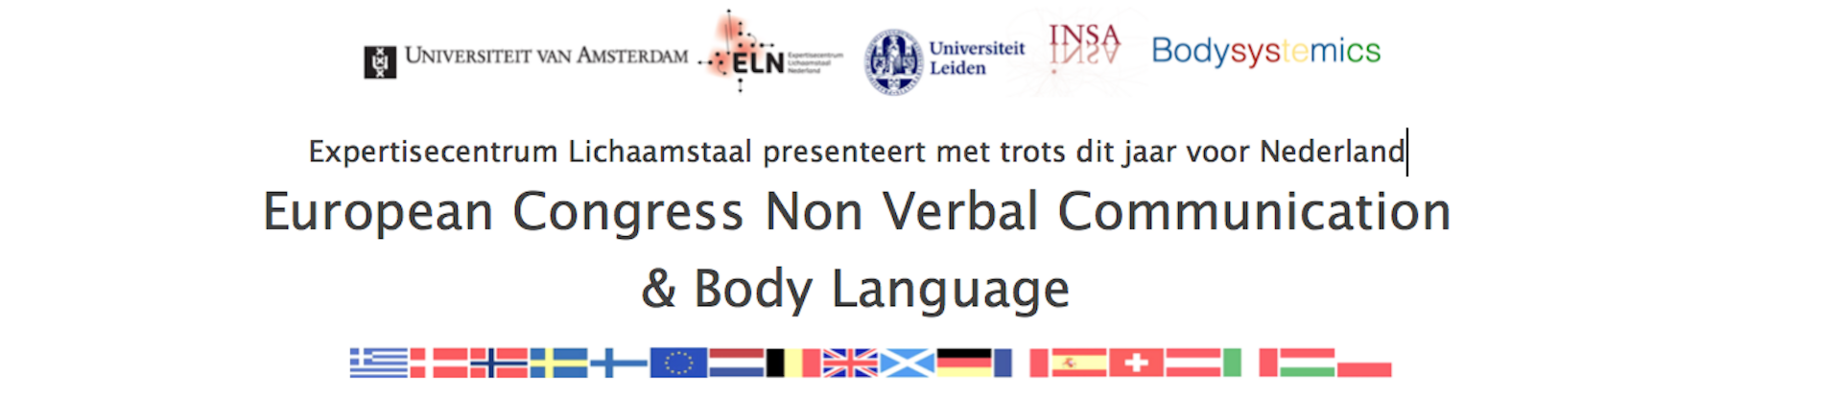 International Congress Non Verbal Communication & Body language